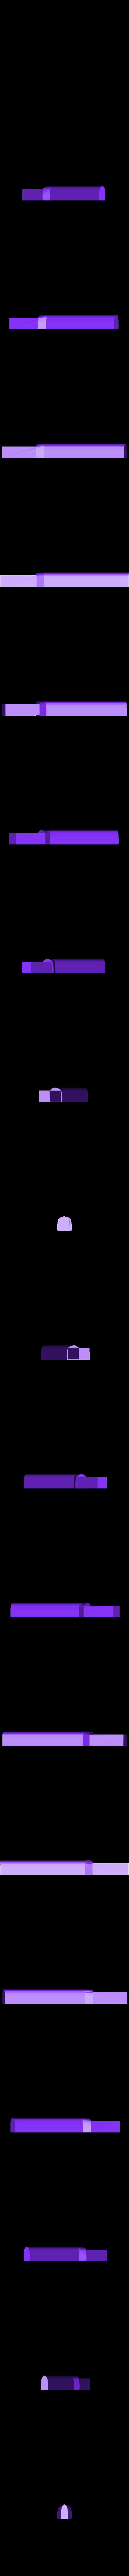 peg.stl Download free STL file Configurable Galton Board • 3D printable object, Girthnath